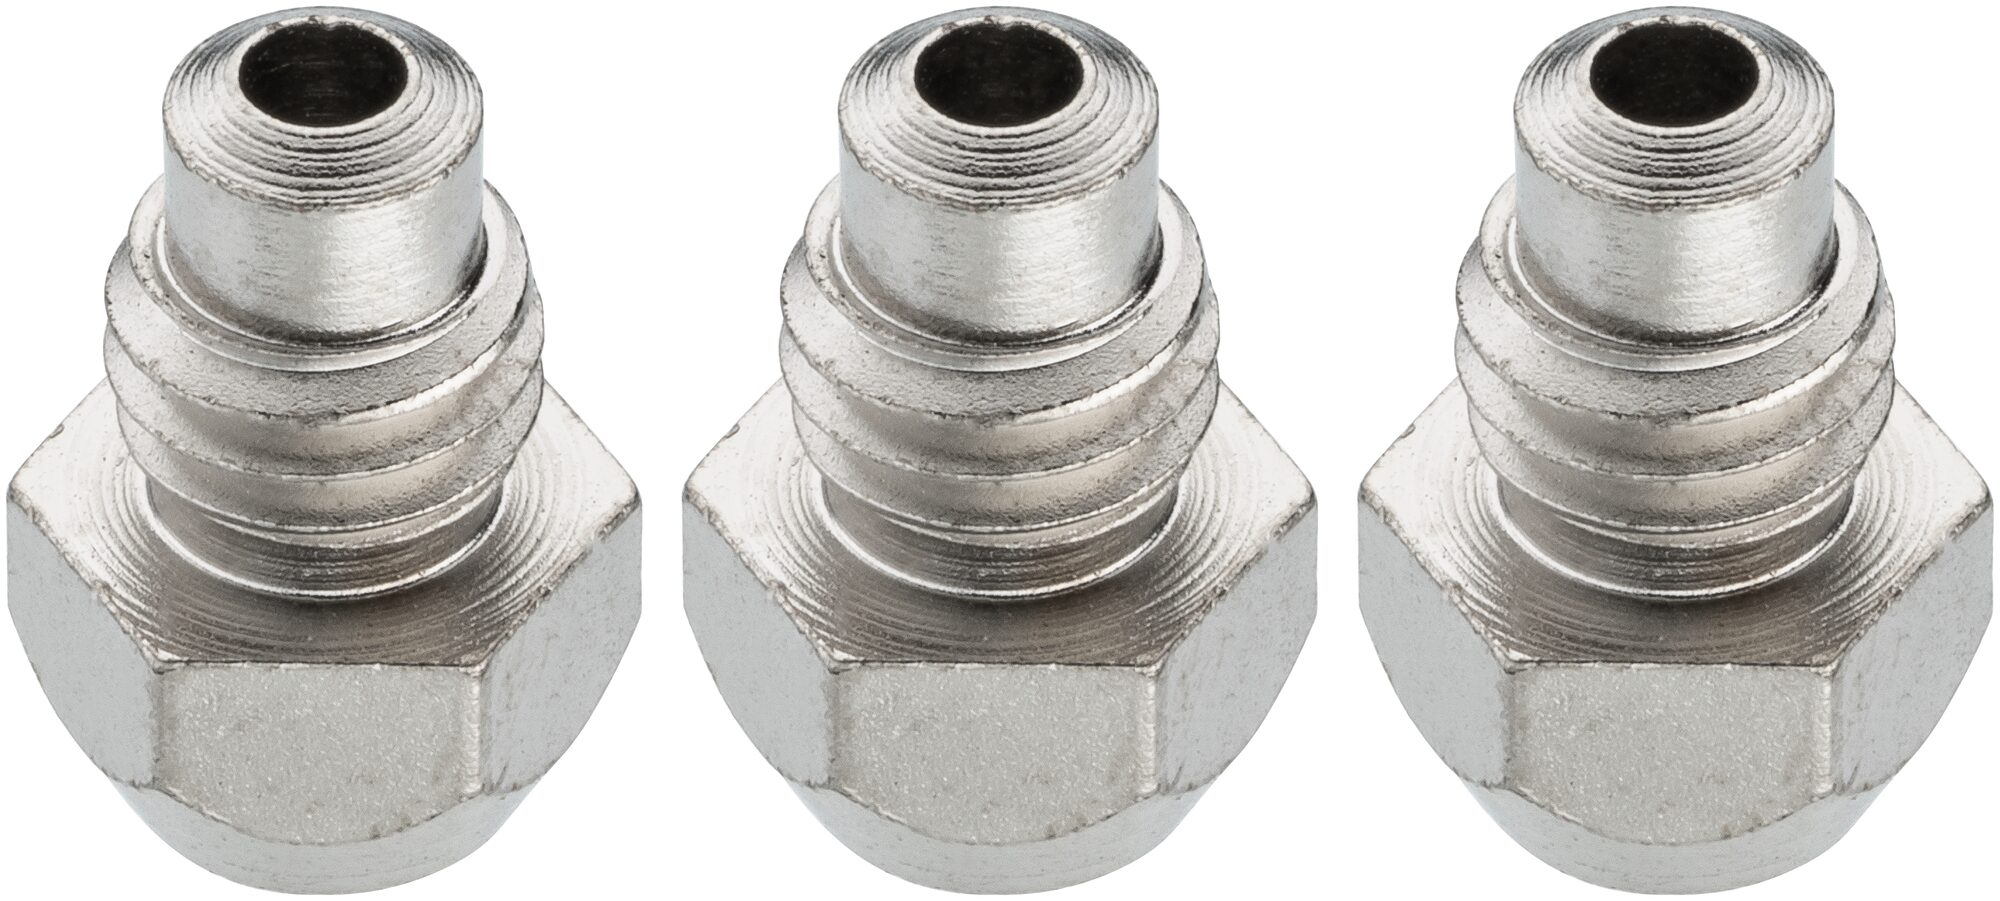 HAZET Mundstück ∙ 4,0mm (5⁄32″) 9037SPC-015/3